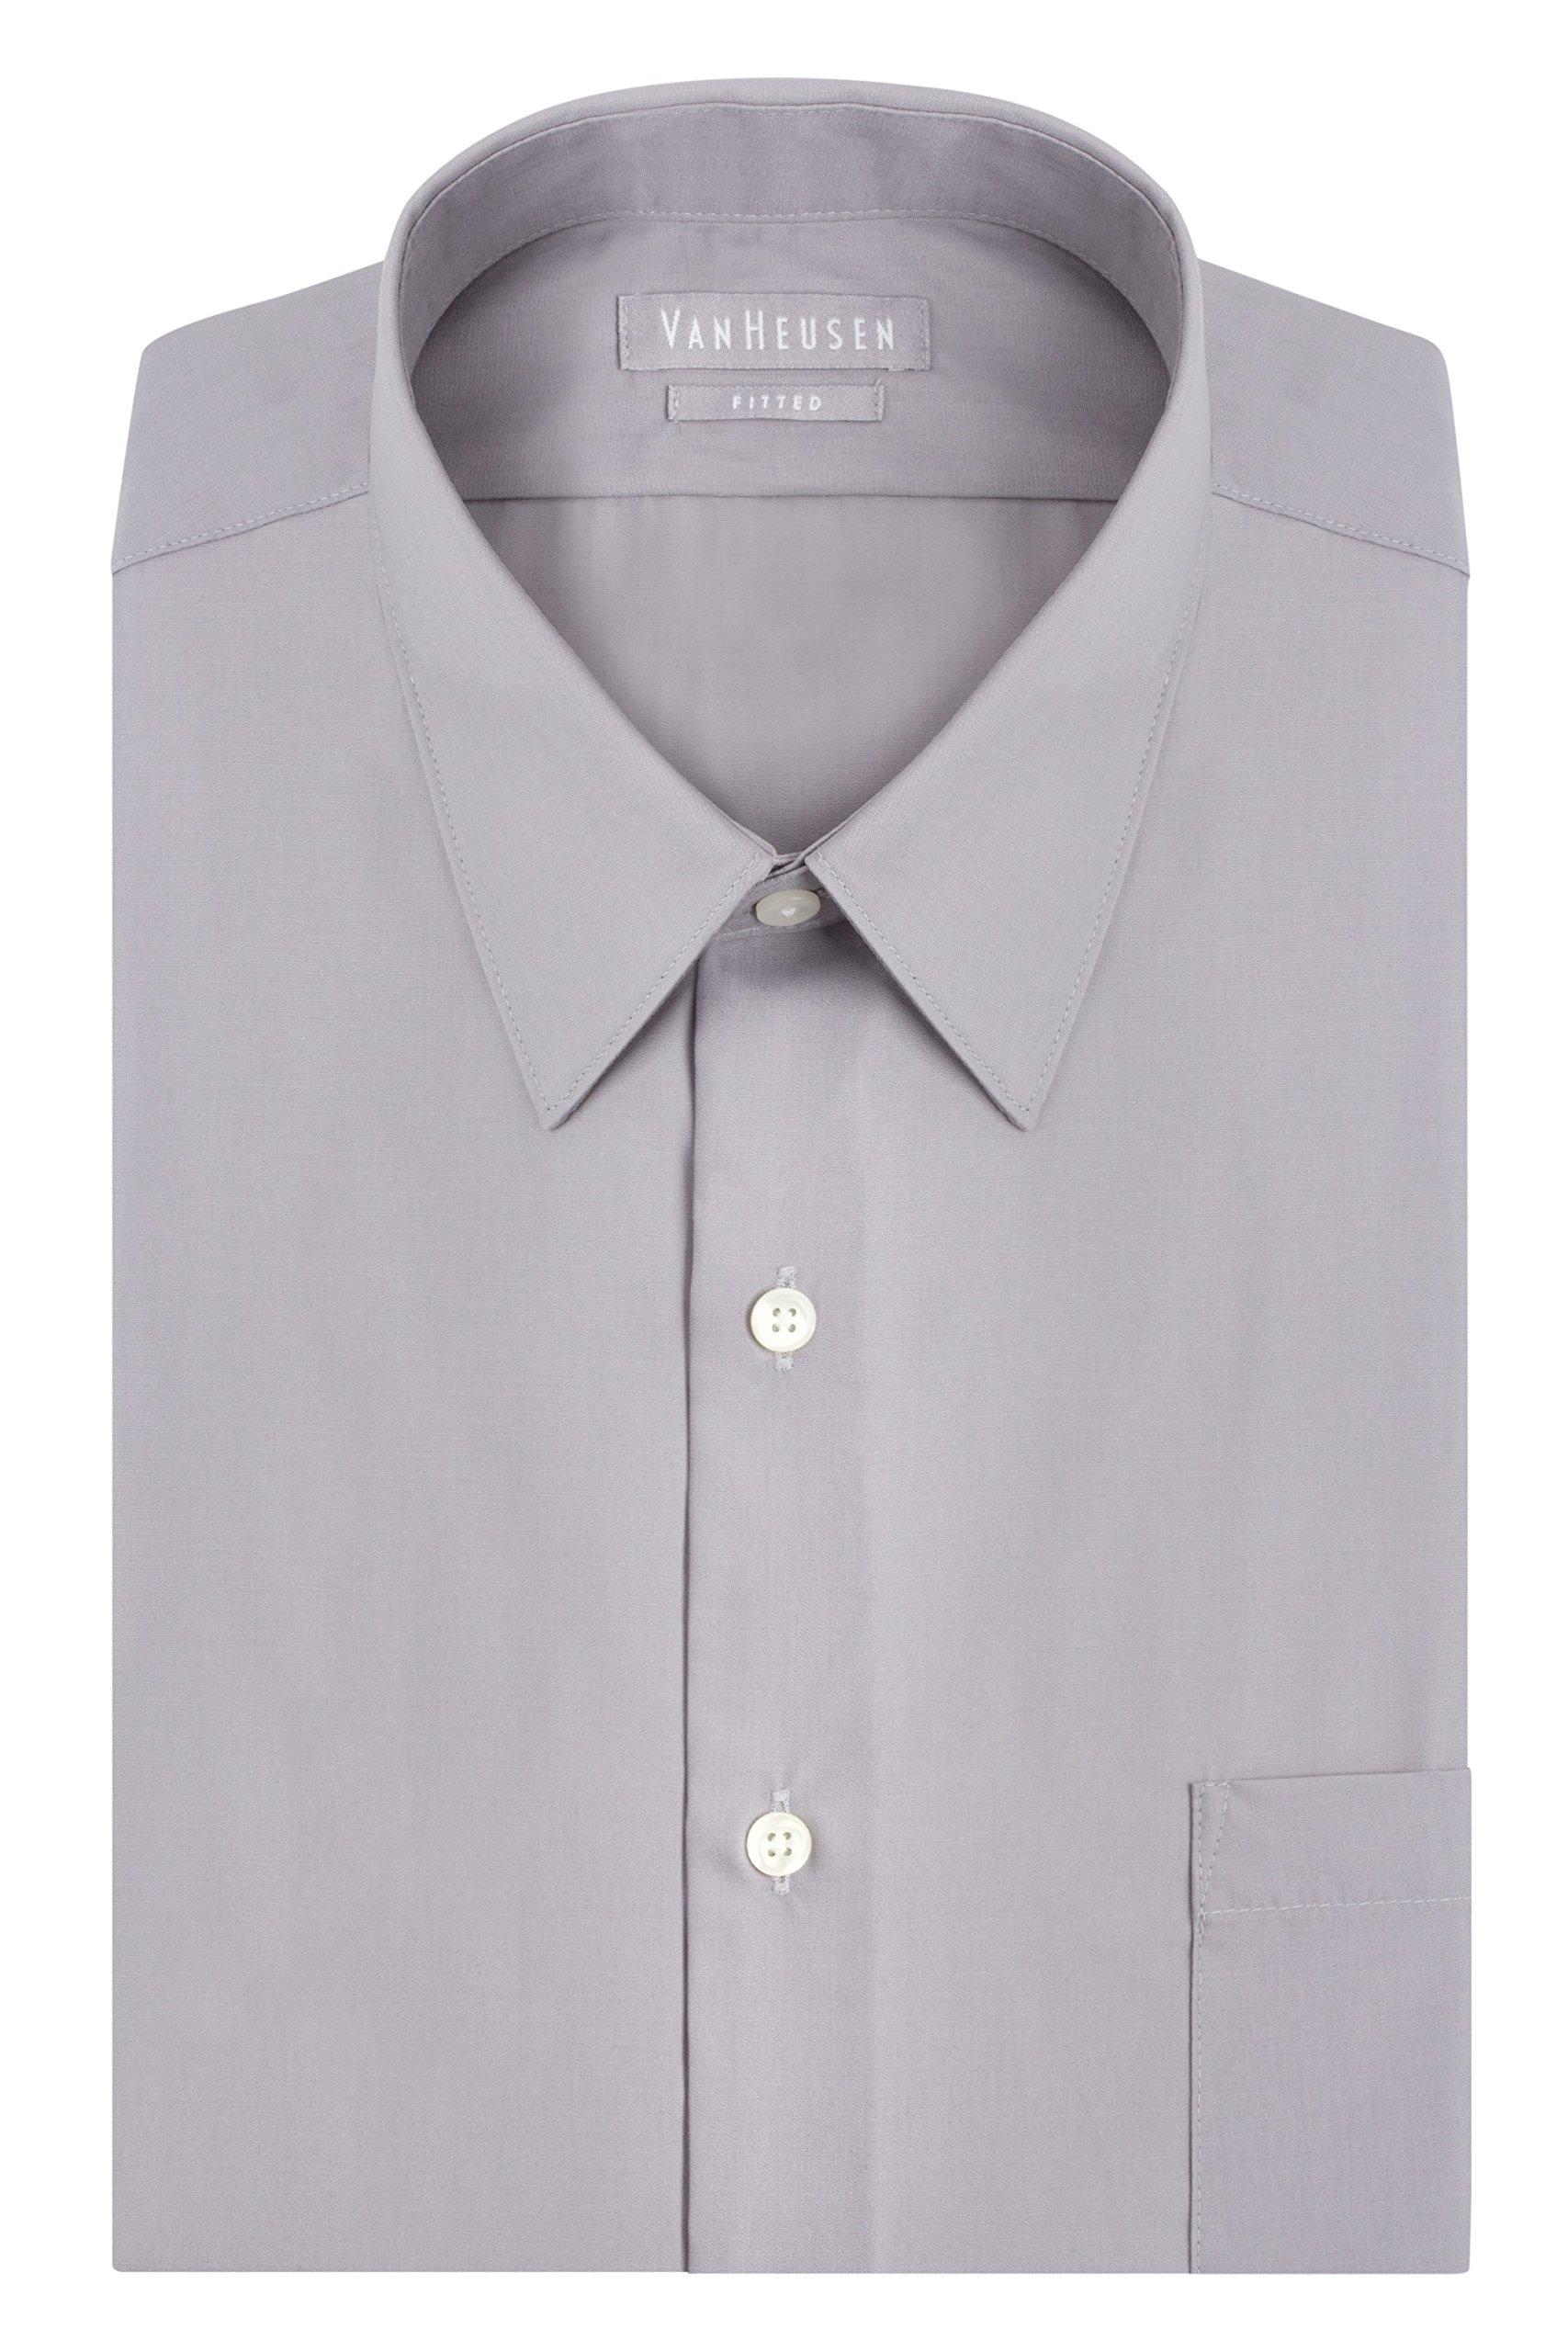 Van Heusen Men's Poplin Fitted Solid Point Collar Dress Shirt, Greystone, 18.5'' Neck 36''-37'' Sleeve